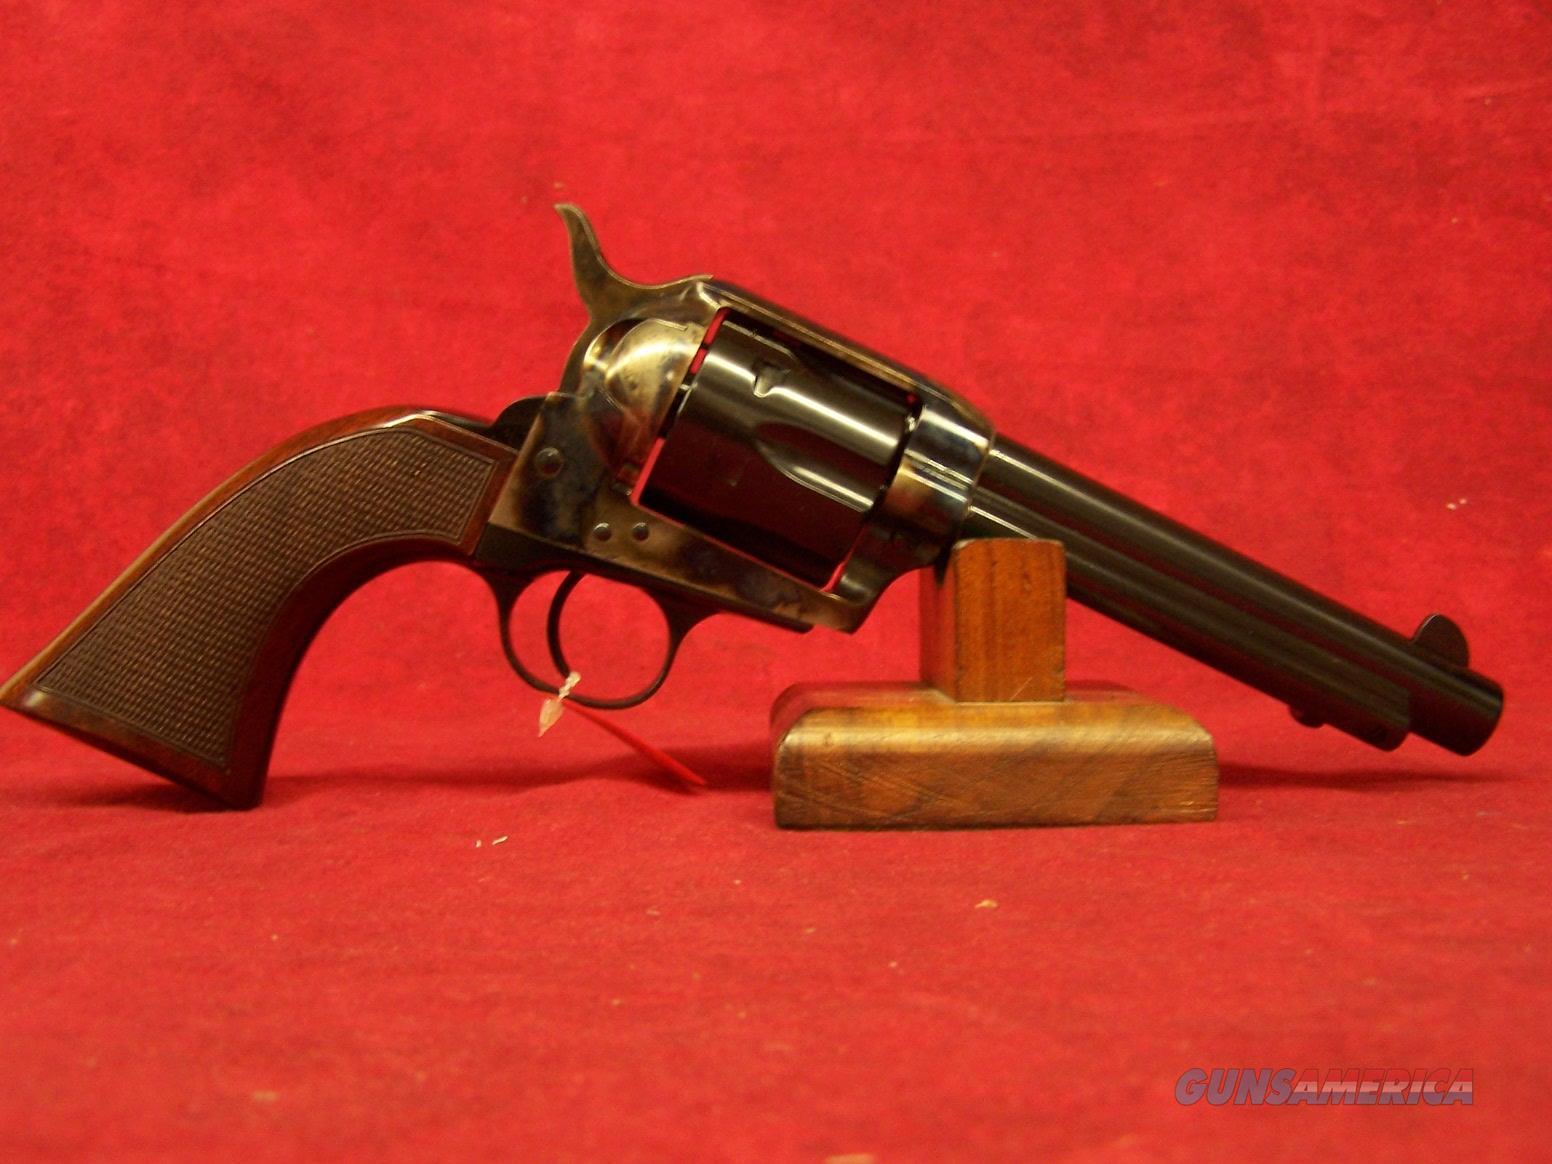 "Uberti El Patron Grizzly Paw .357 Mag 5.5"" Barrel (345272)  Guns > Pistols > Uberti Pistols > Ctg."